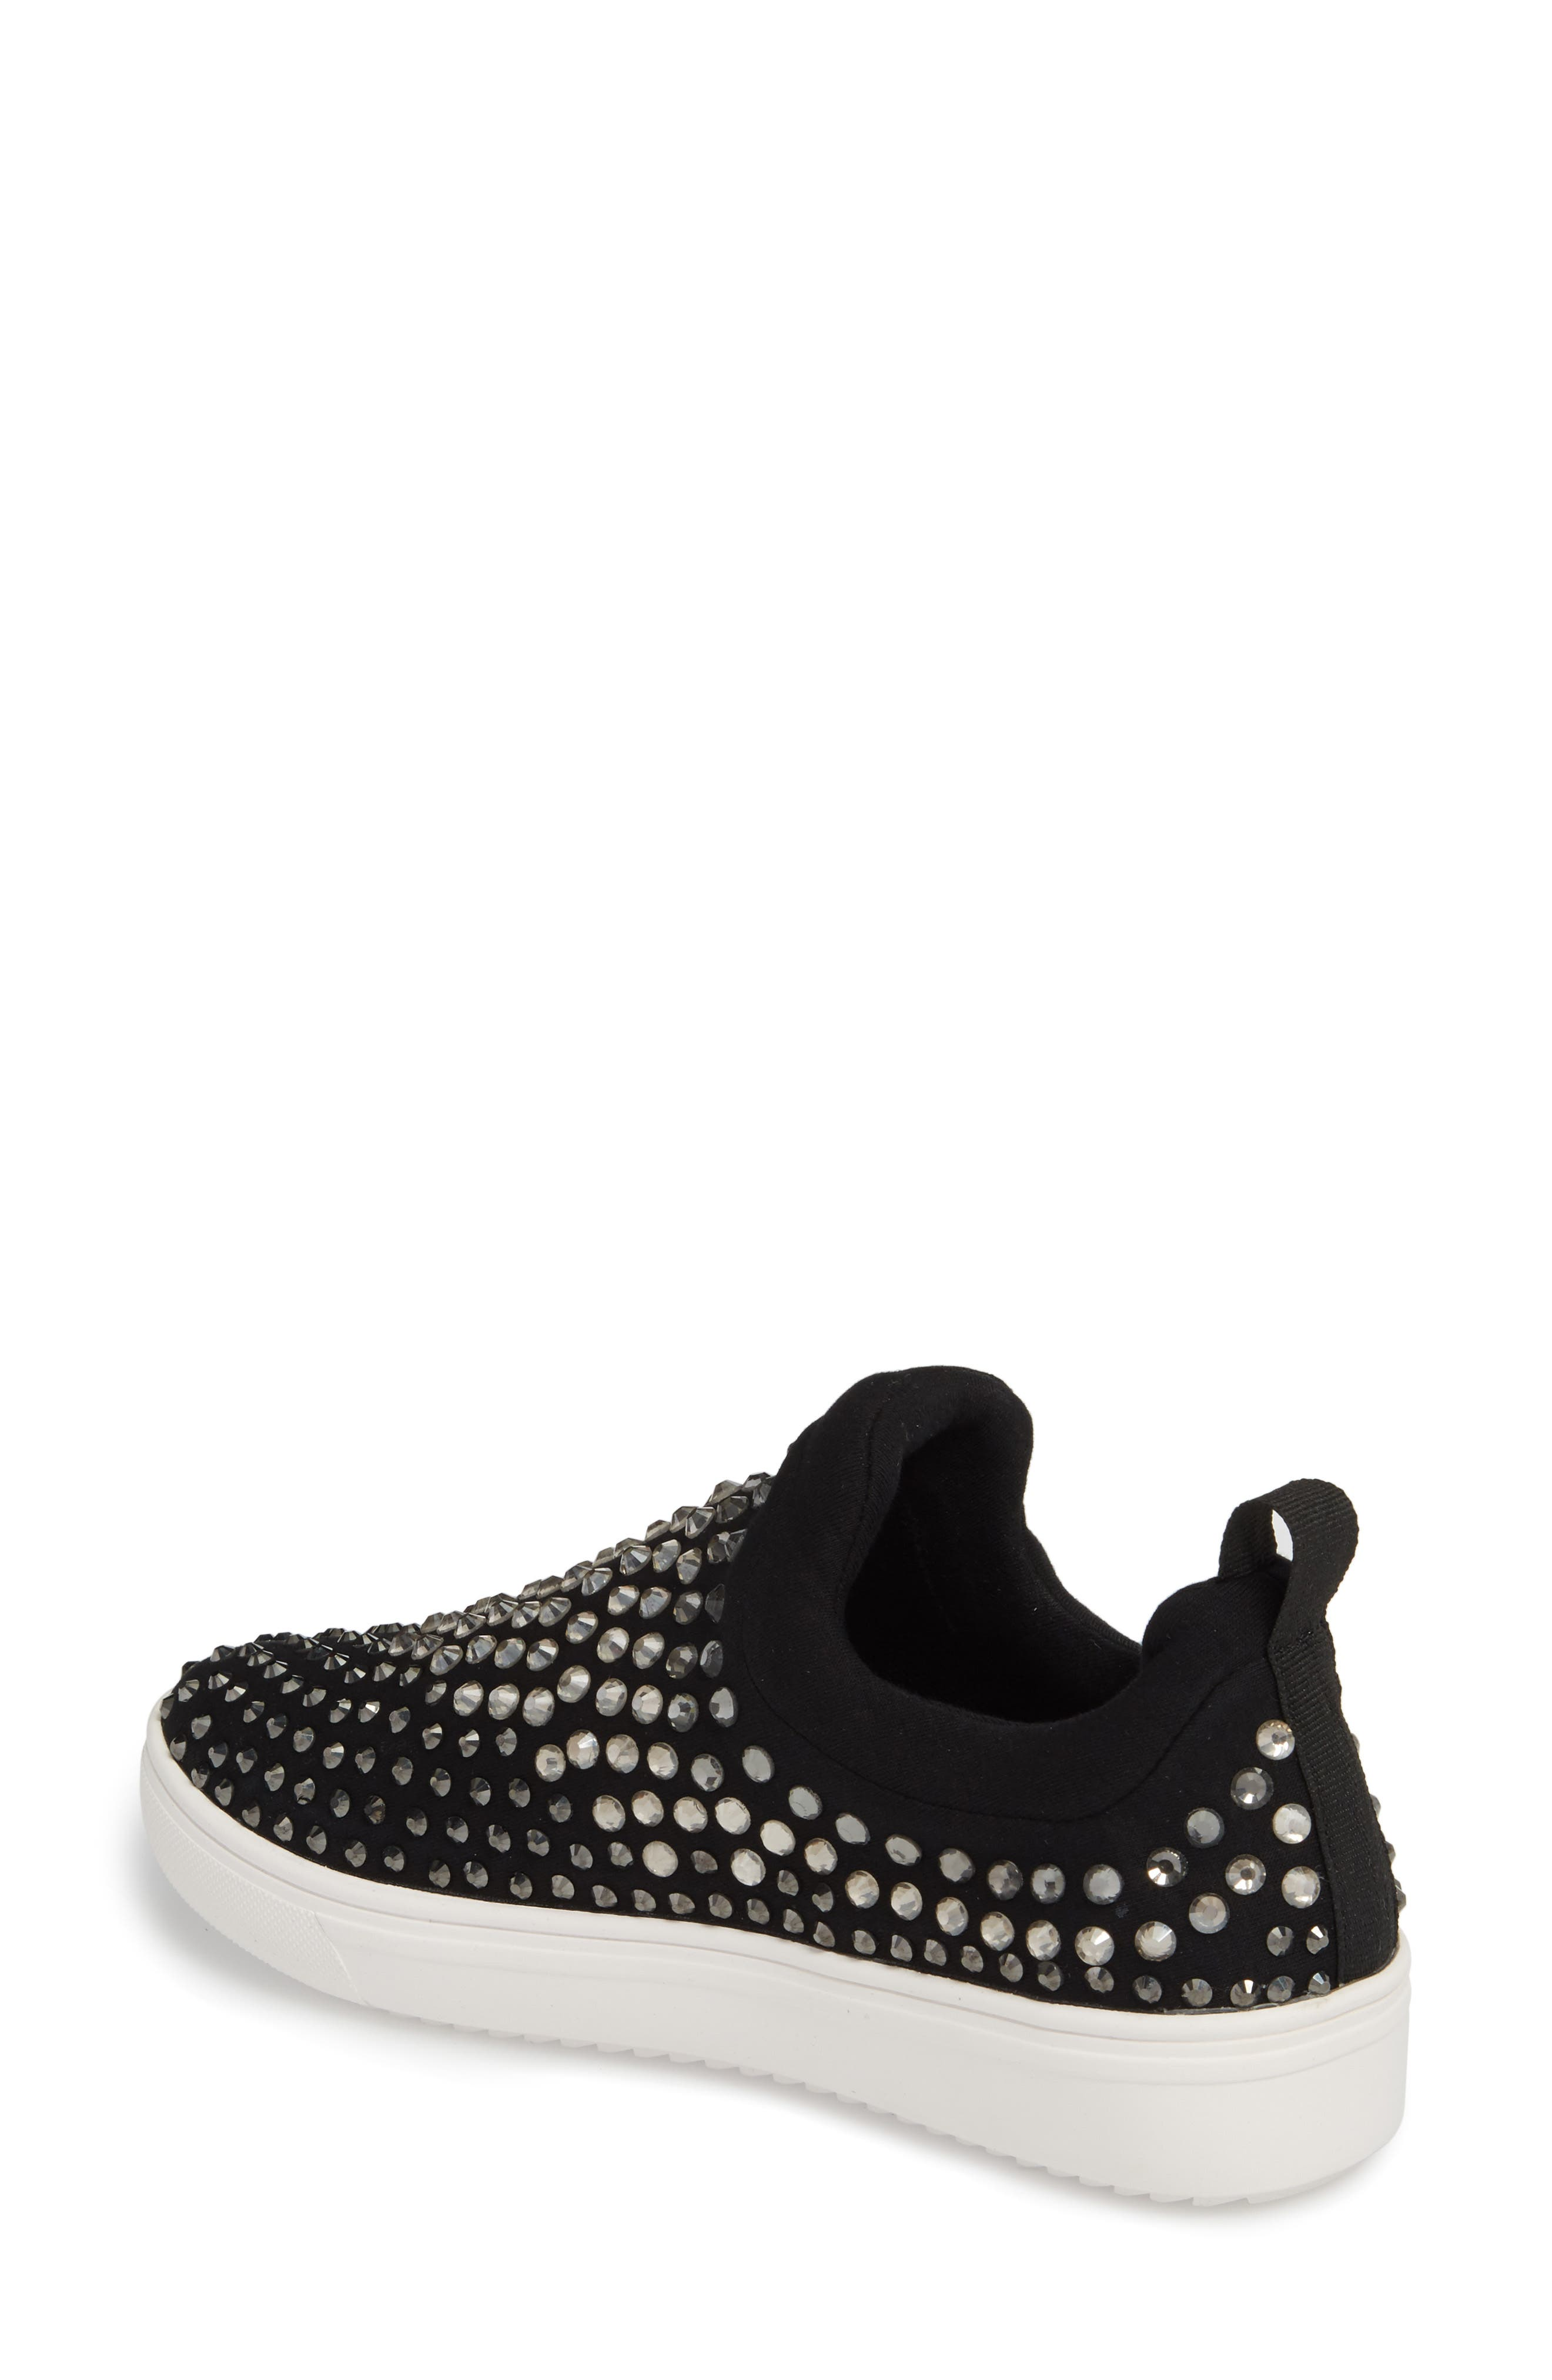 Sherry Crystal Embellished Sneaker,                             Alternate thumbnail 2, color,                             Black Multi Fabric